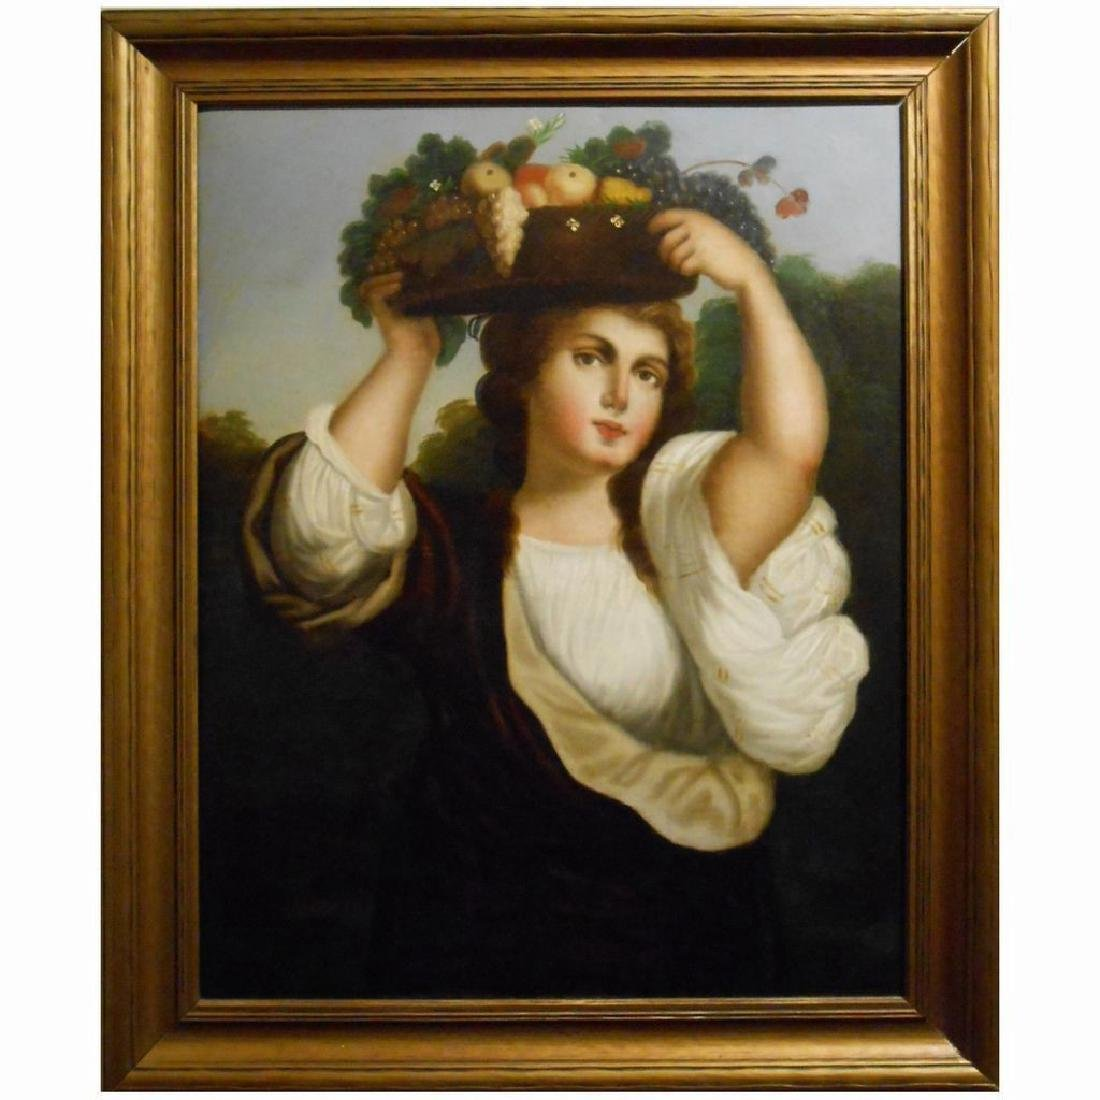 Antique c.1800 Italian Oil Painting Of Woman